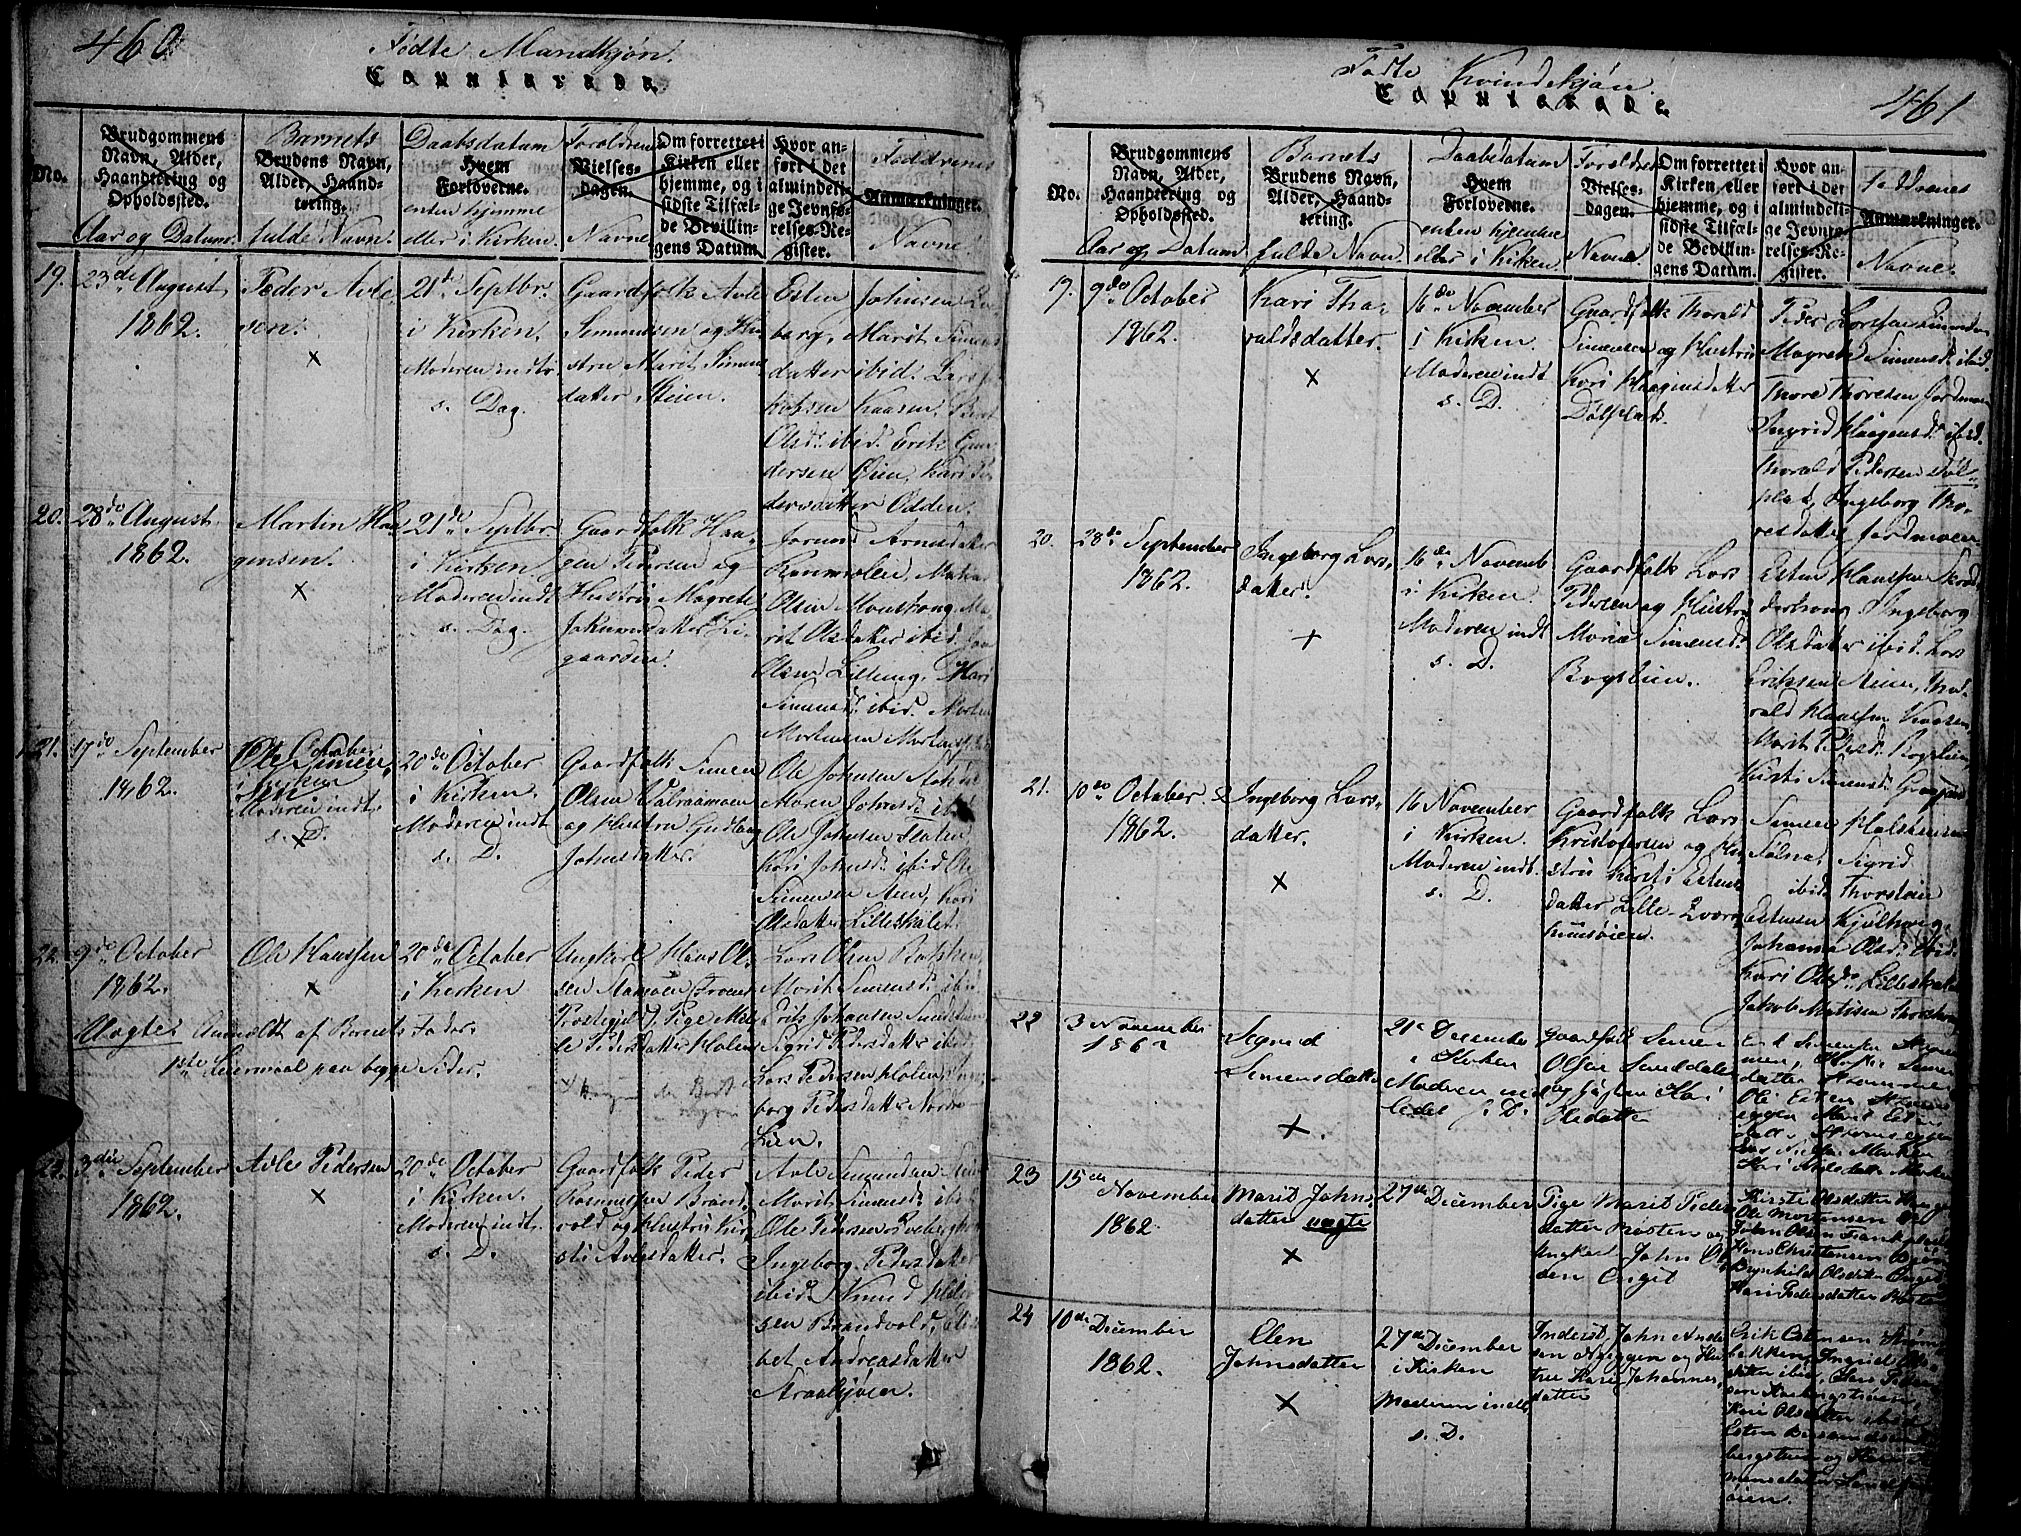 SAH, Tynset prestekontor, Klokkerbok nr. 2, 1814-1862, s. 460-461